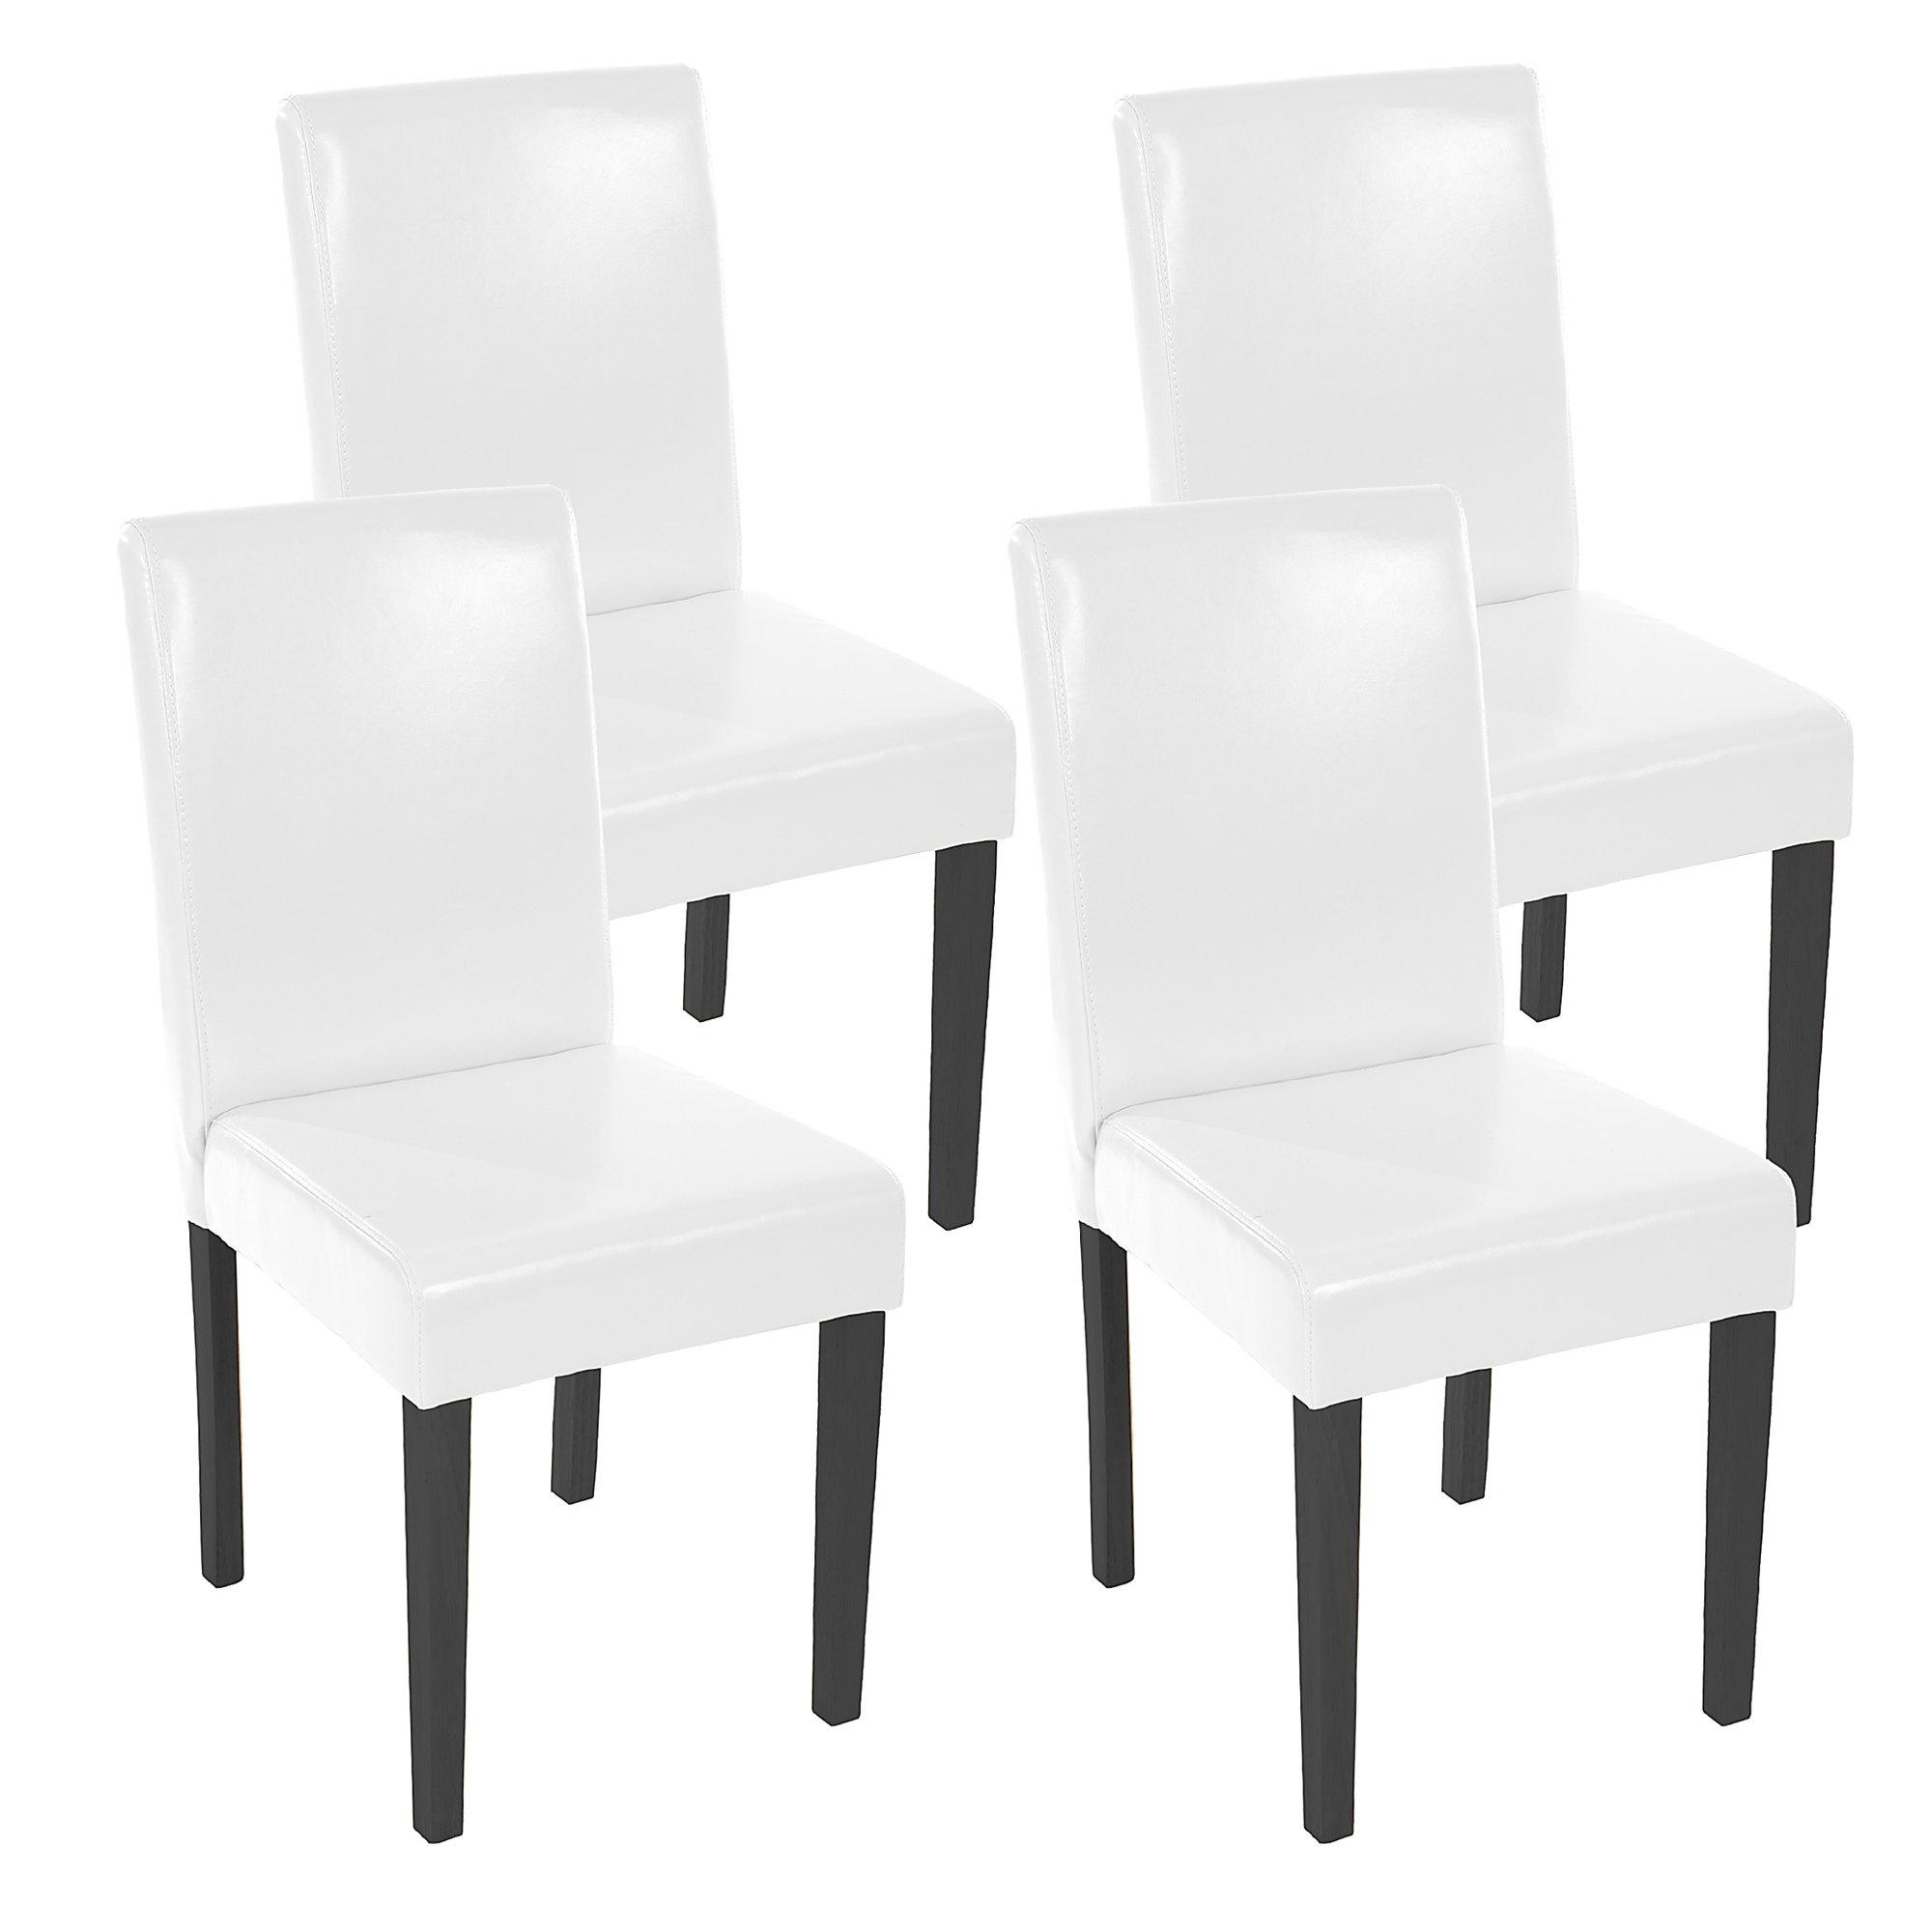 Demo lote 4 sillas de comedor litau precioso dise o for Sillas de comedor negras